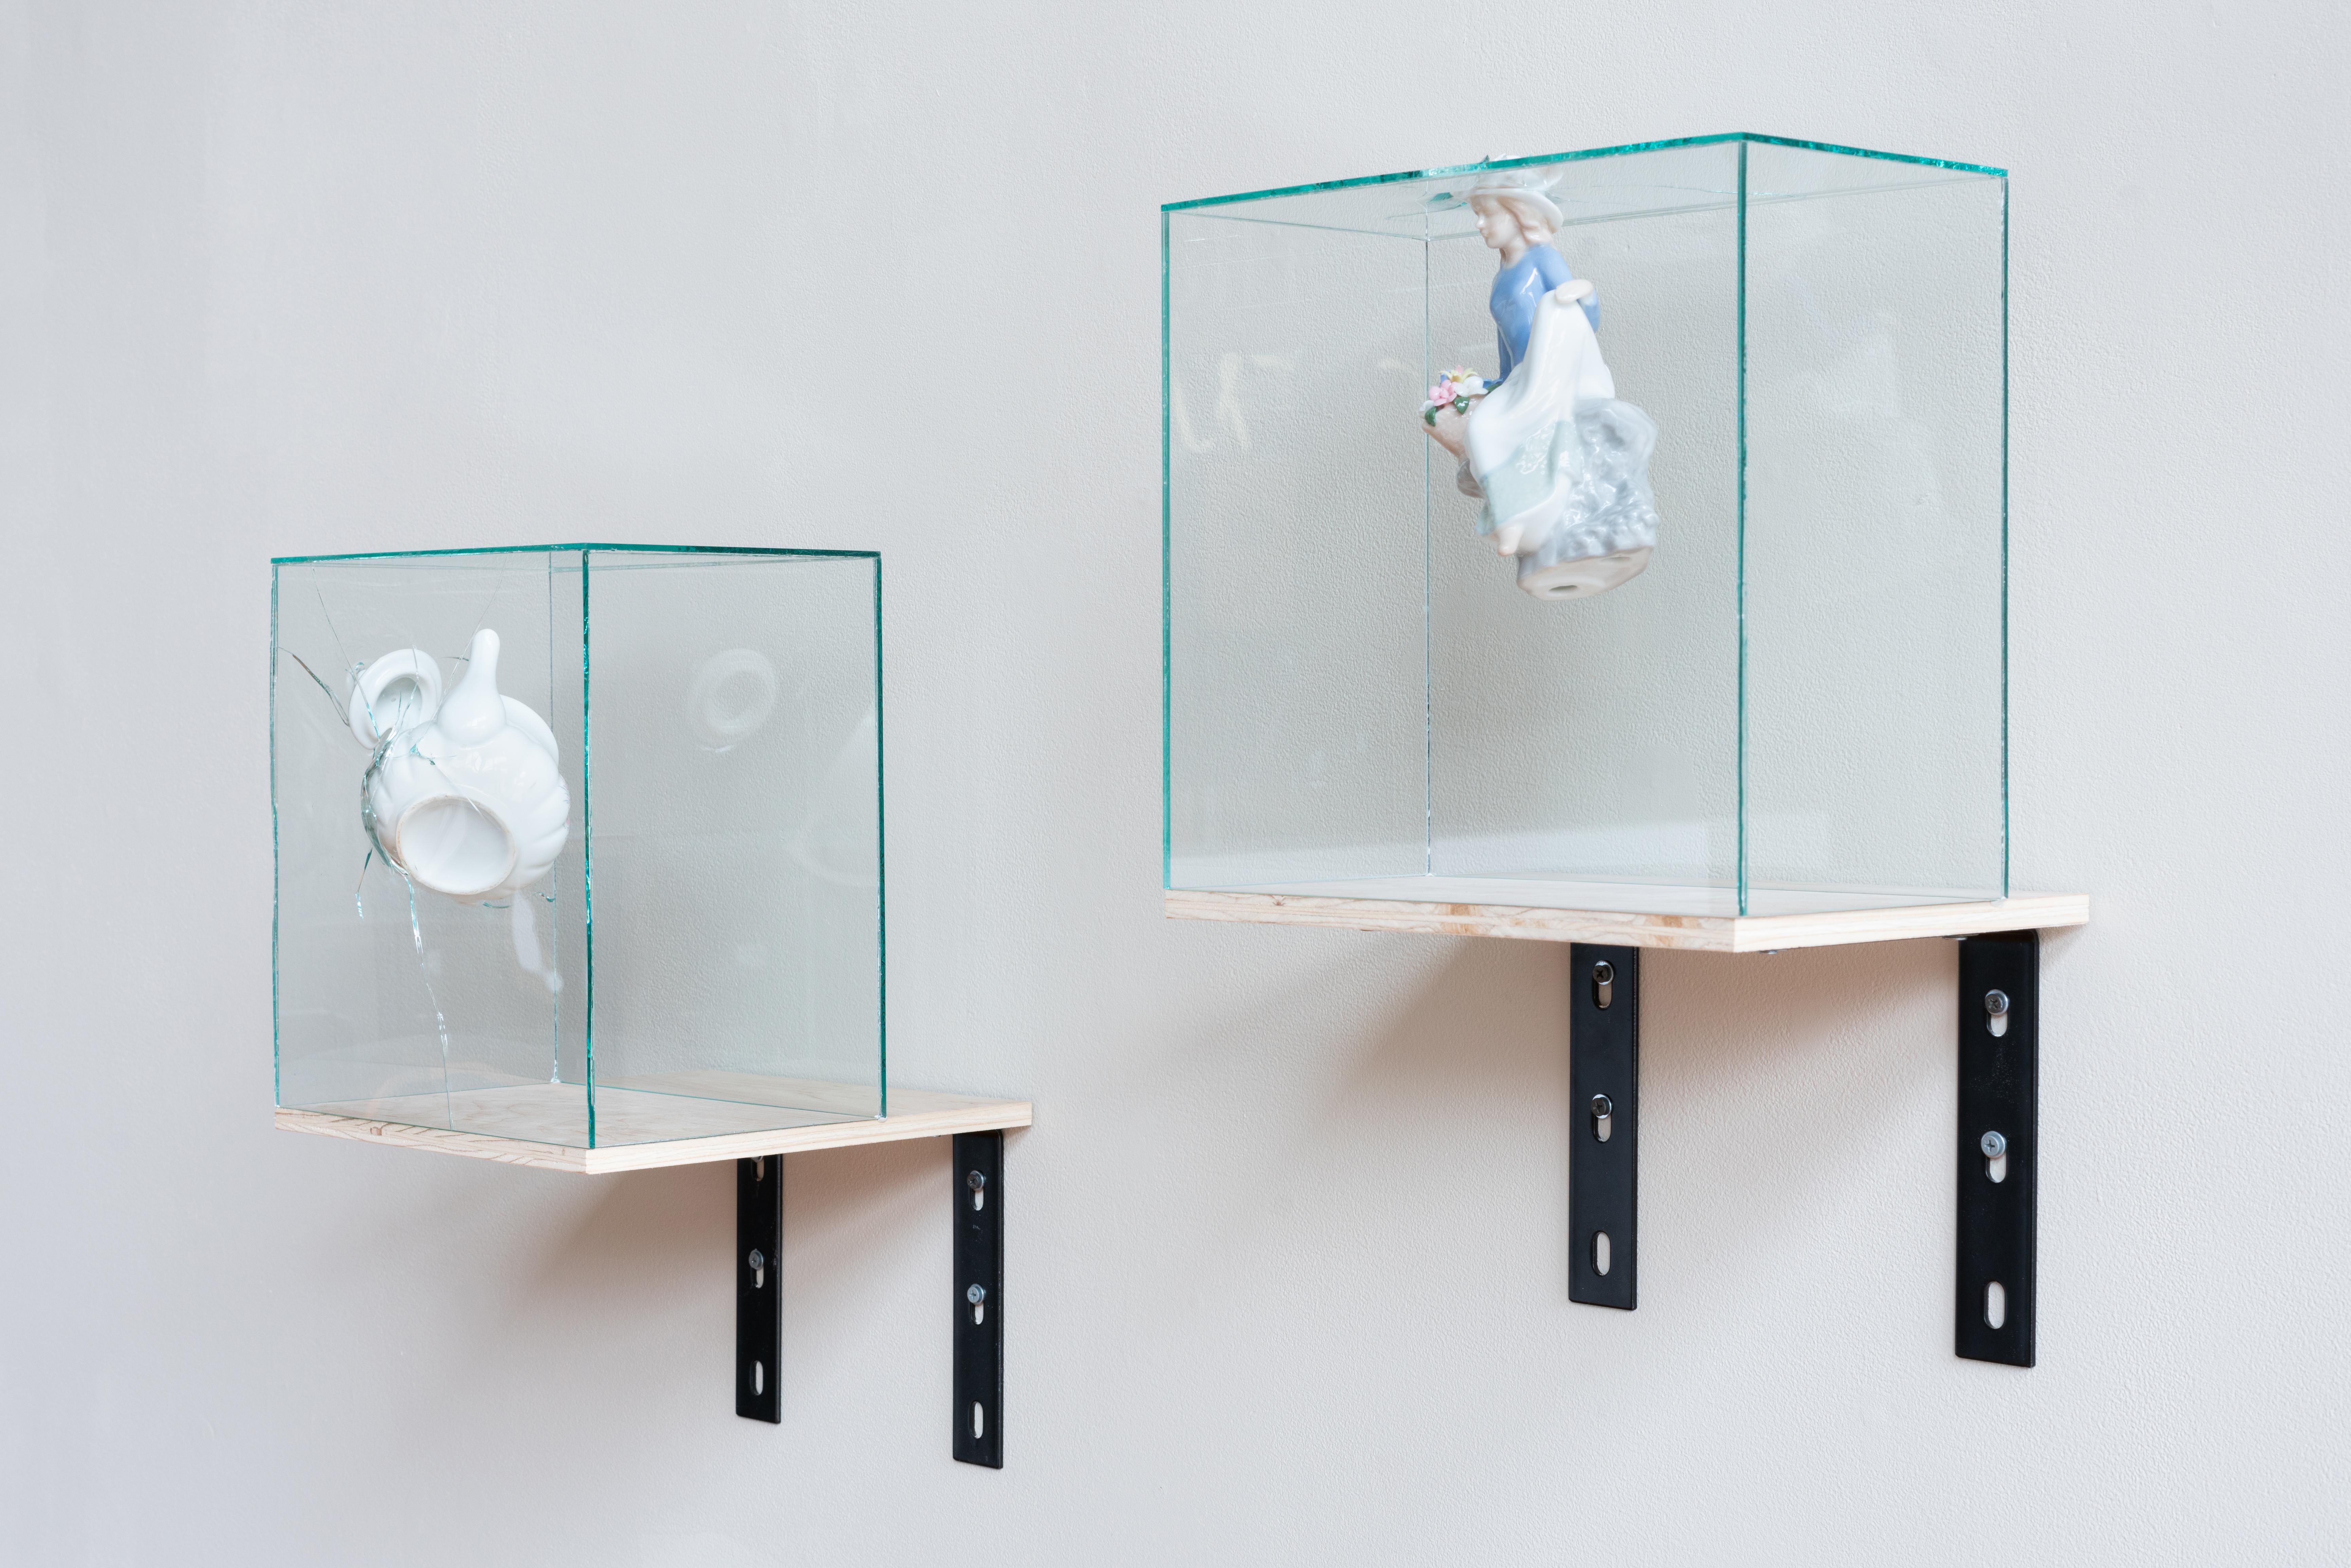 Maria_Bang_Decoration_Studies_Tea_Pot_and_Figurine_Side